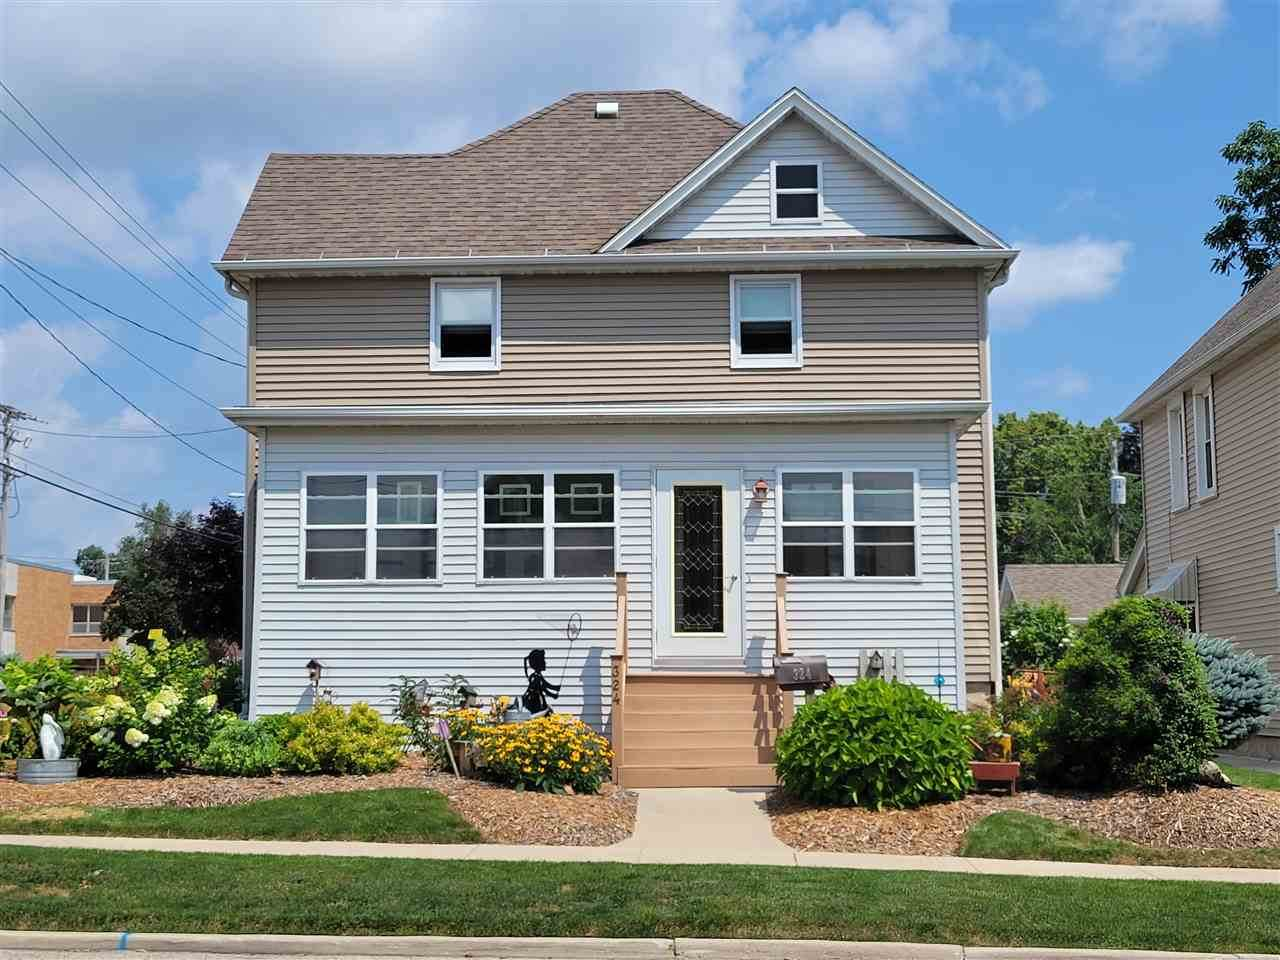 324 Maple Ave - Photo 1